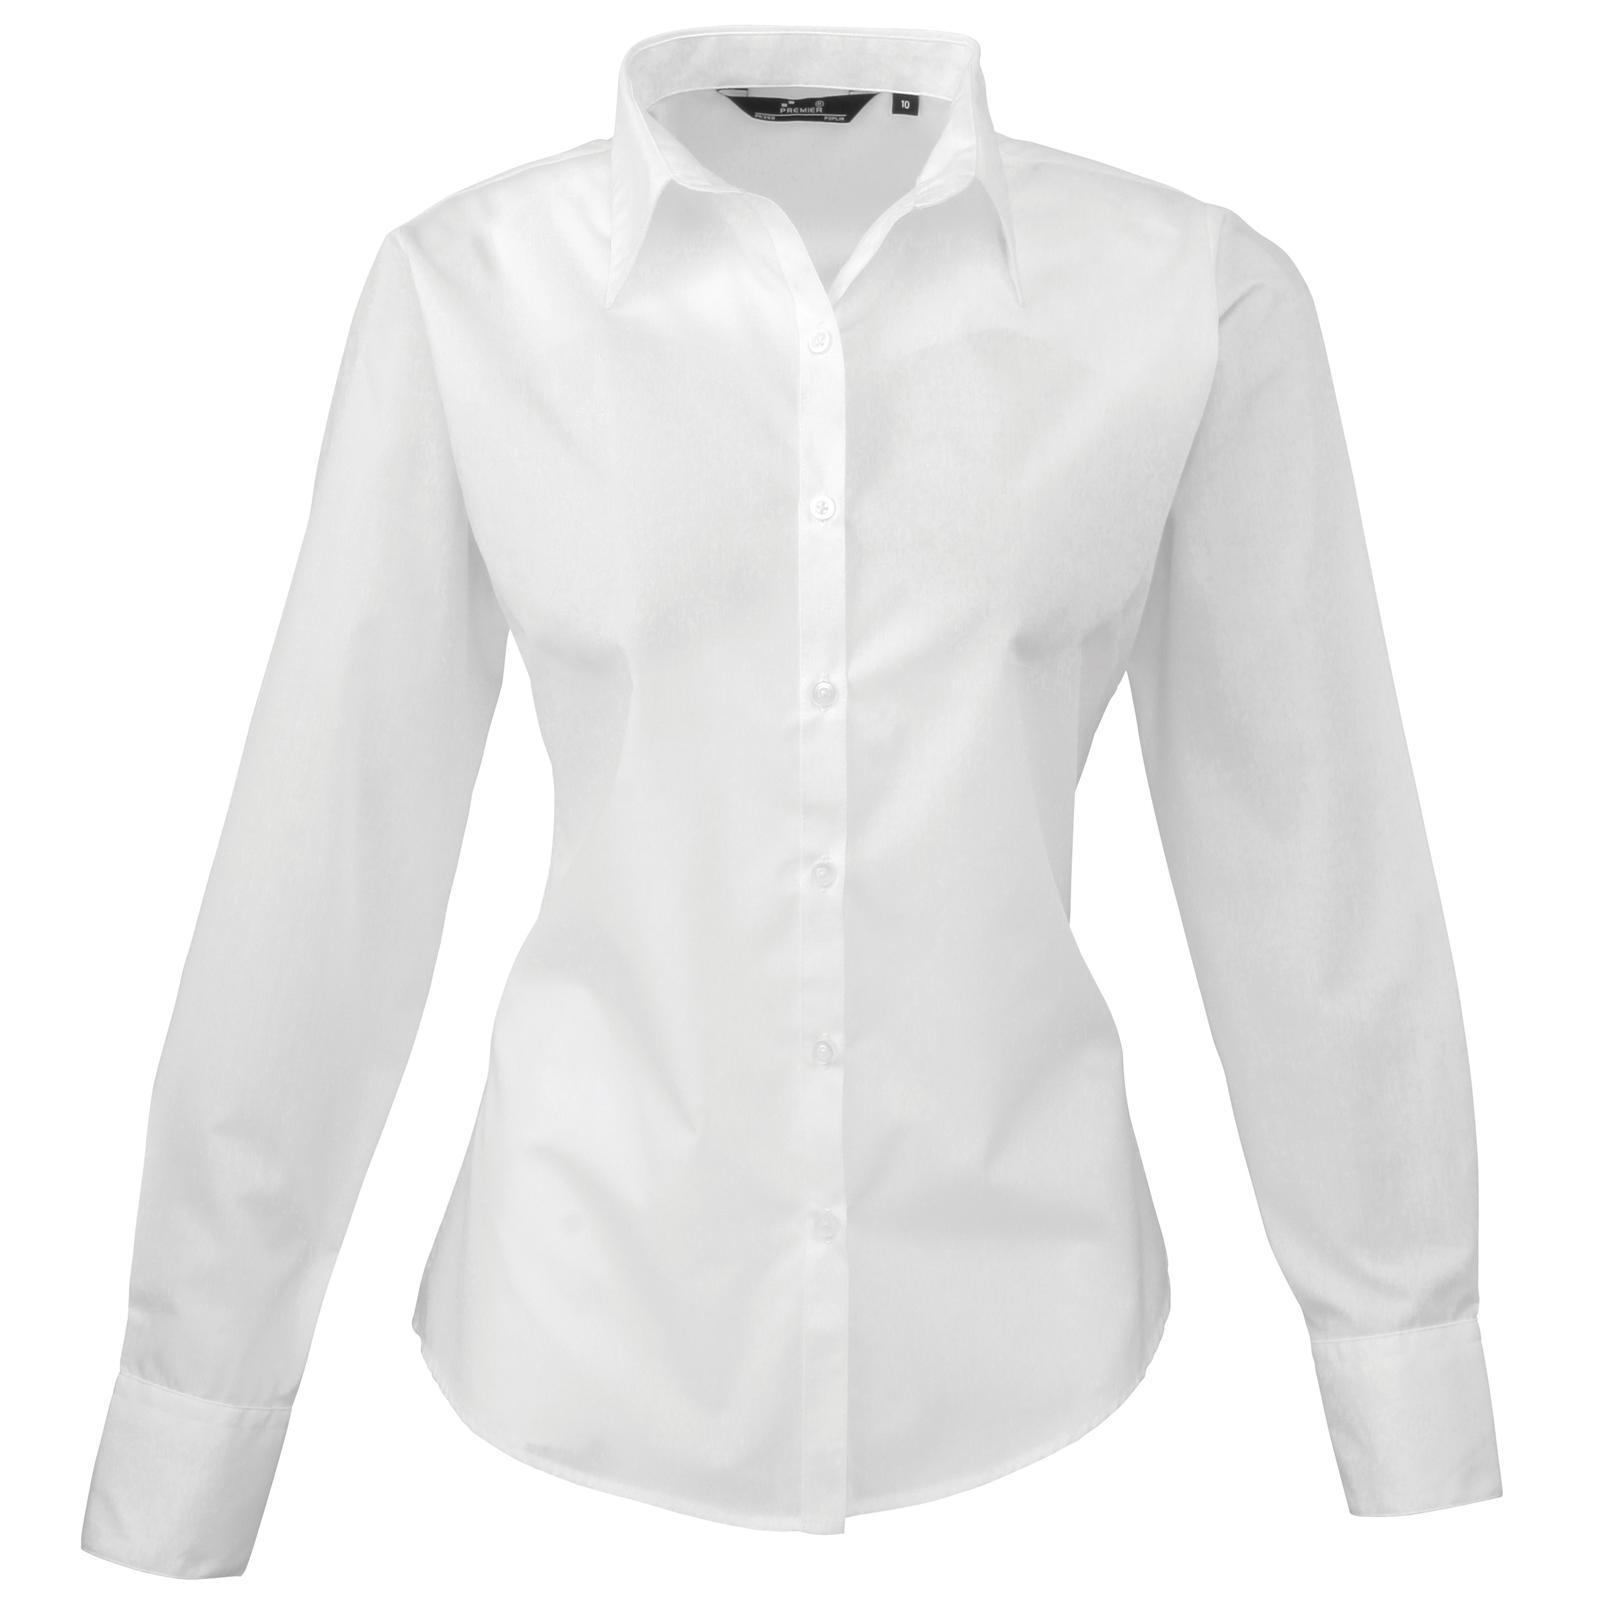 New PREMIER Womens Ladies Poplin Long Sleeve Blouse Shirt 24 Colours Size 6 - 26